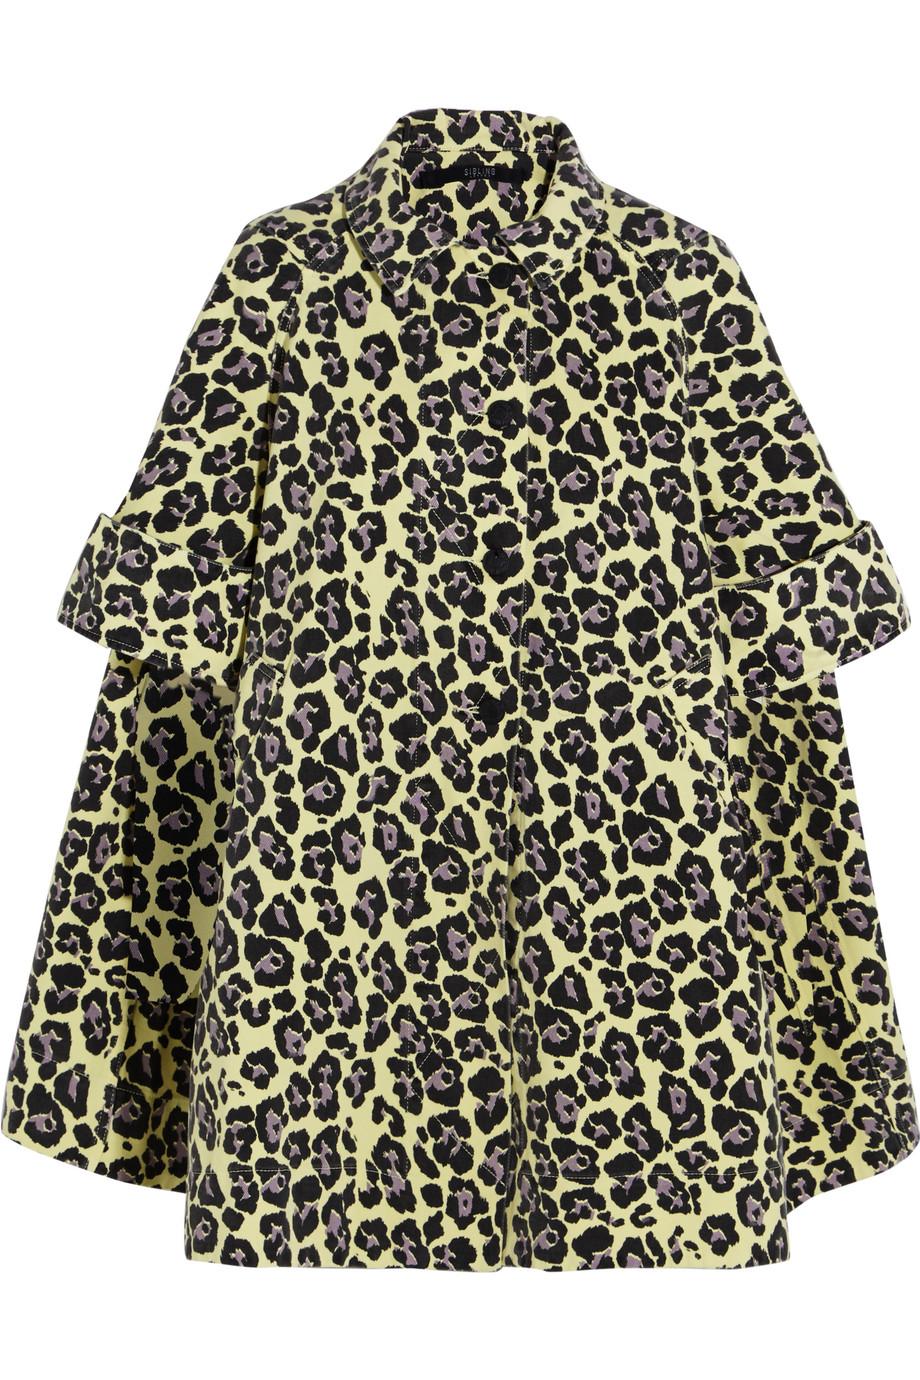 Sibling Oversized Leopard-Print Denim Coat, Yellow/Leopard Print, Women's